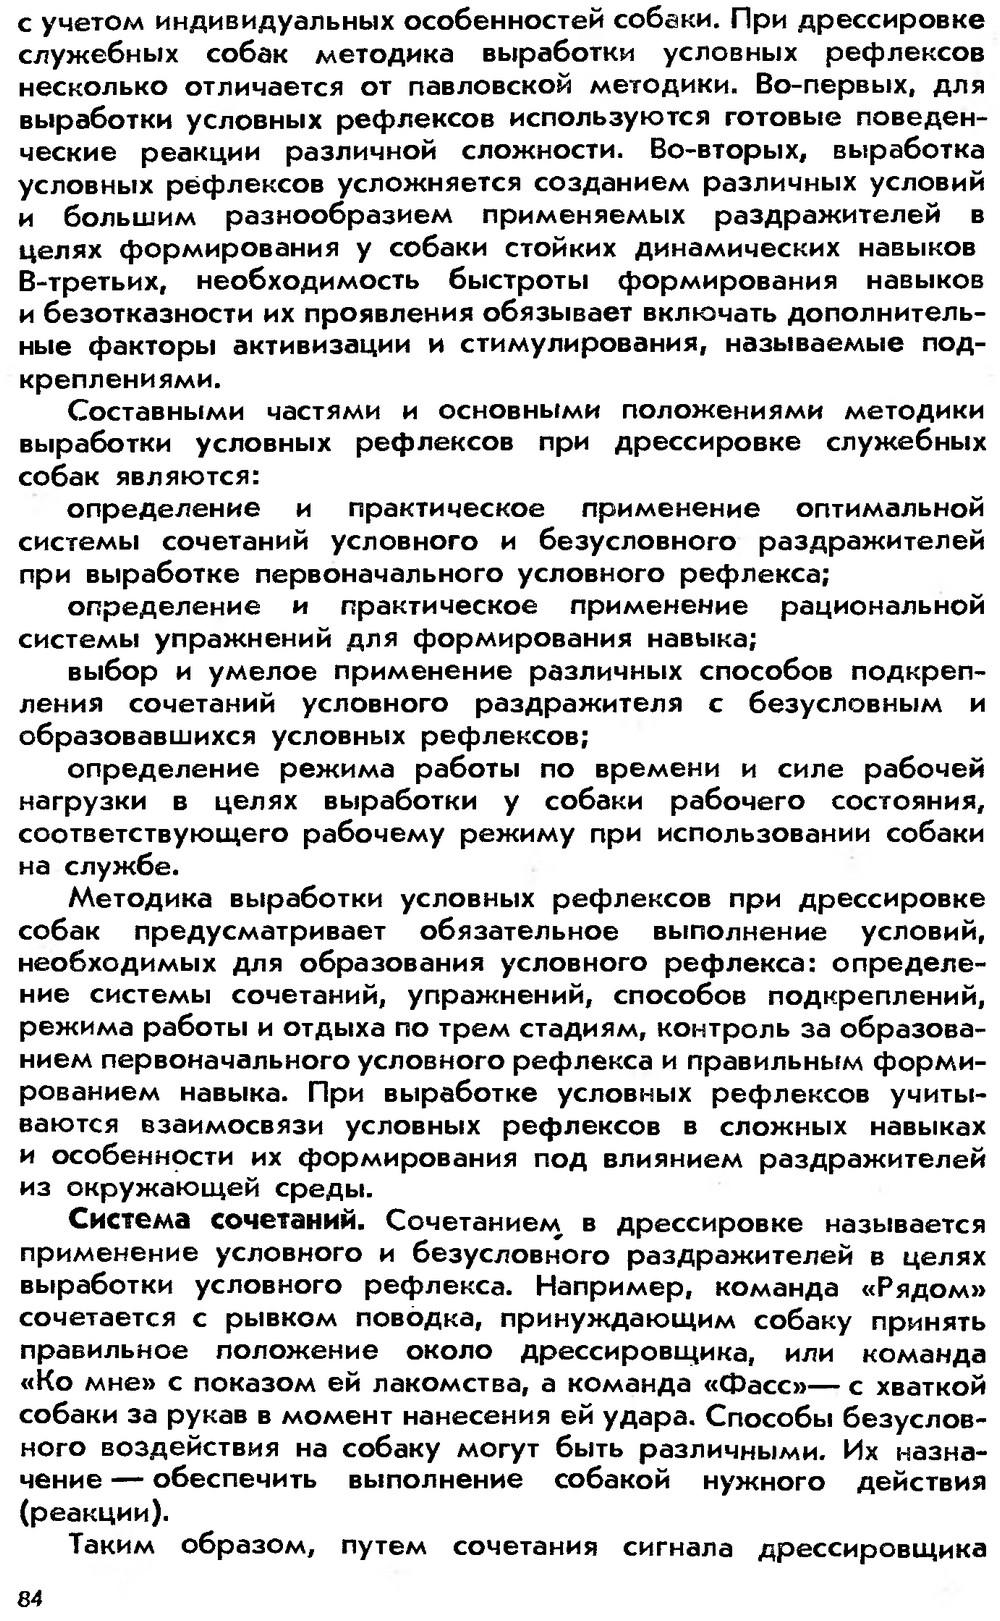 http://i2.imageban.ru/out/2014/01/15/ef3d32563a1f69fd297001a781abb03b.jpg